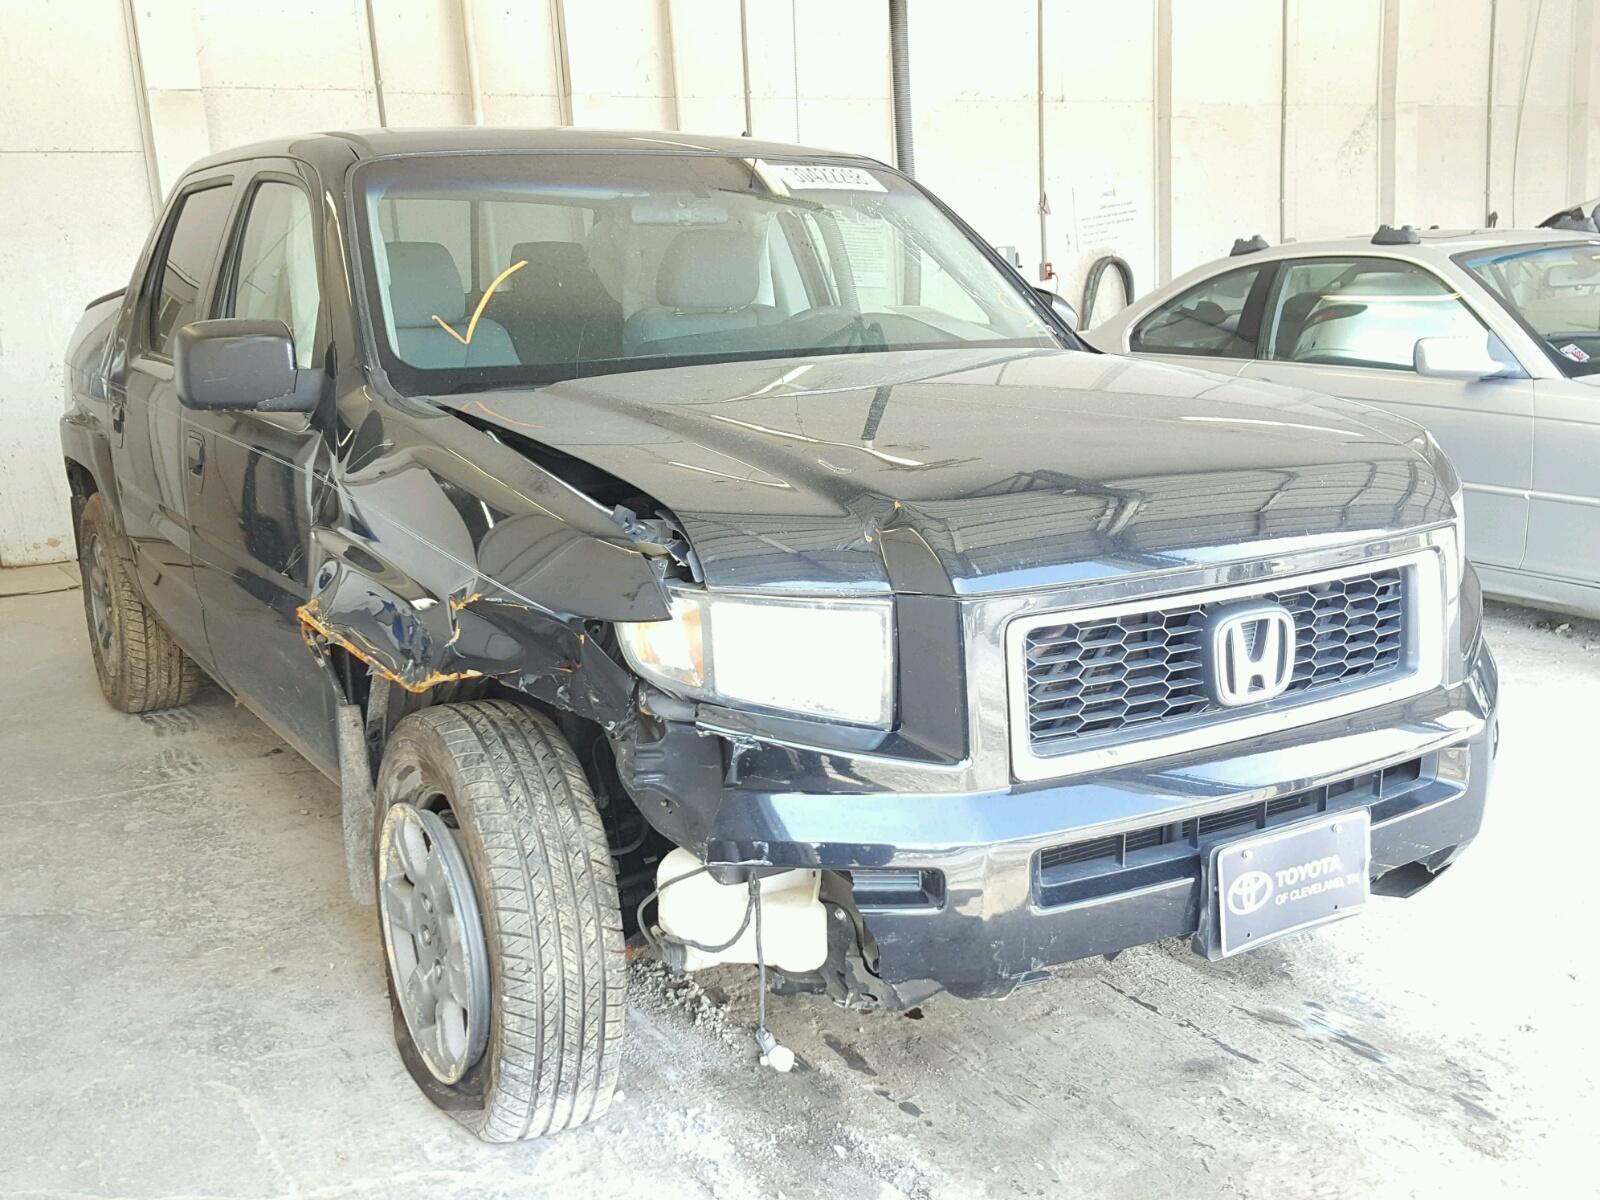 2008 honda ridgeline frame damage damage 2hjyk16308h502014 sold Ridgeline Structure 2008 honda ridgeline 1